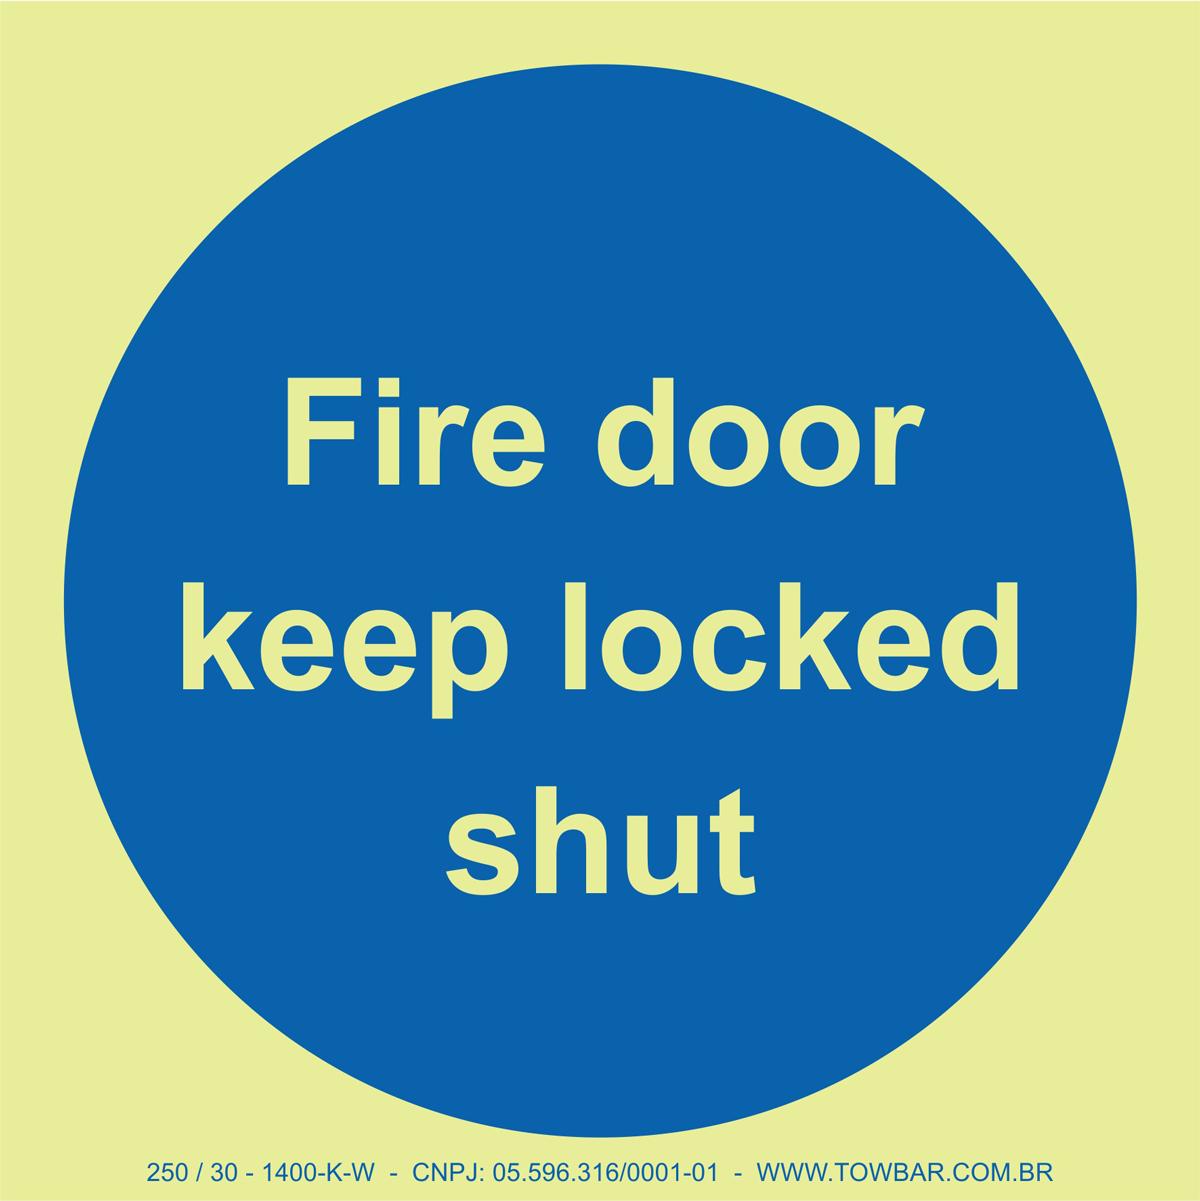 Fire Door Keep Locked Shut  - Towbar Sinalização de Segurança